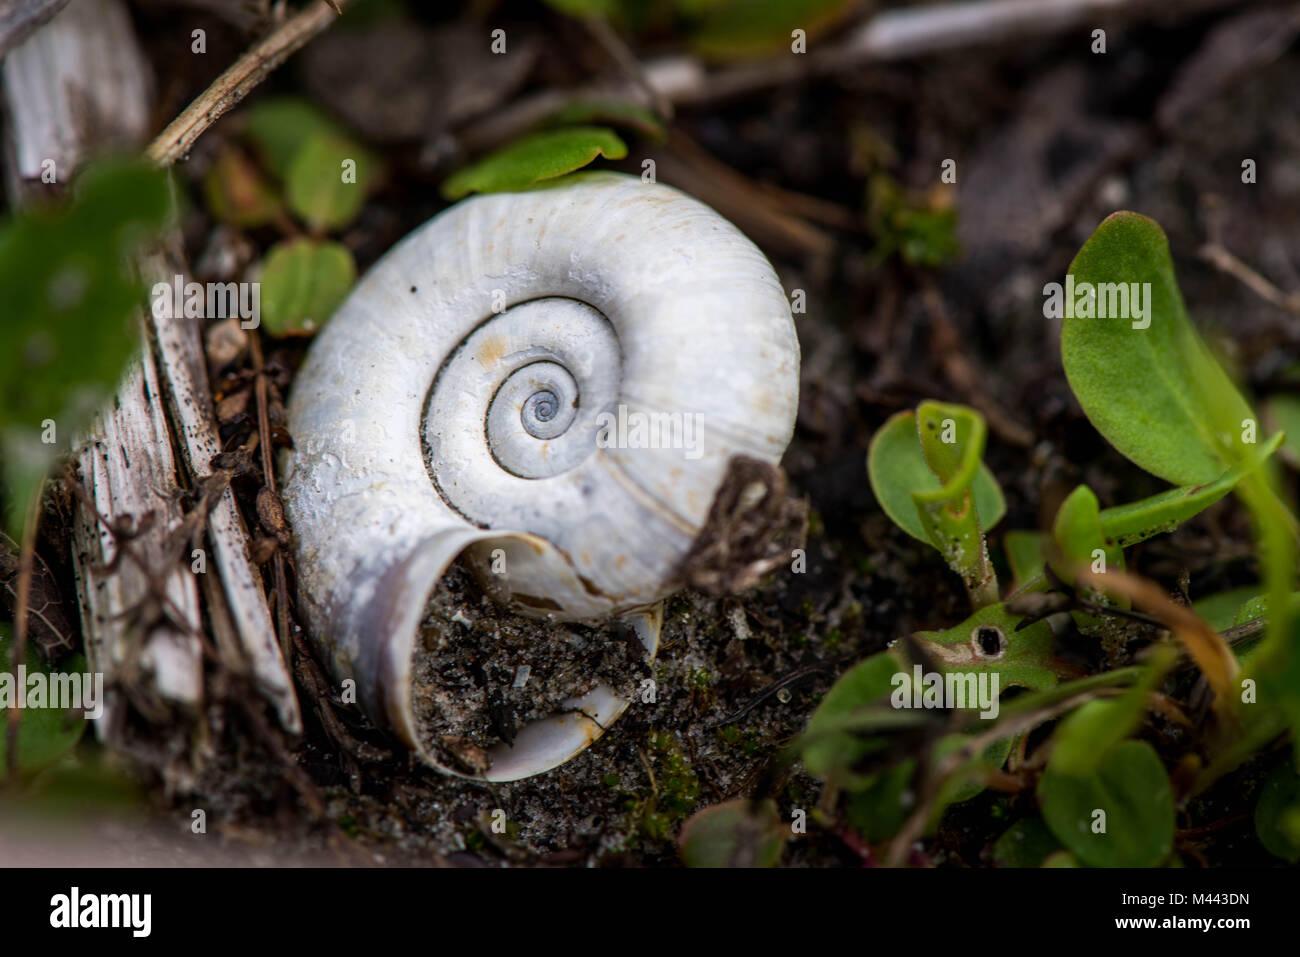 Macro shot of a shell - Stock Image